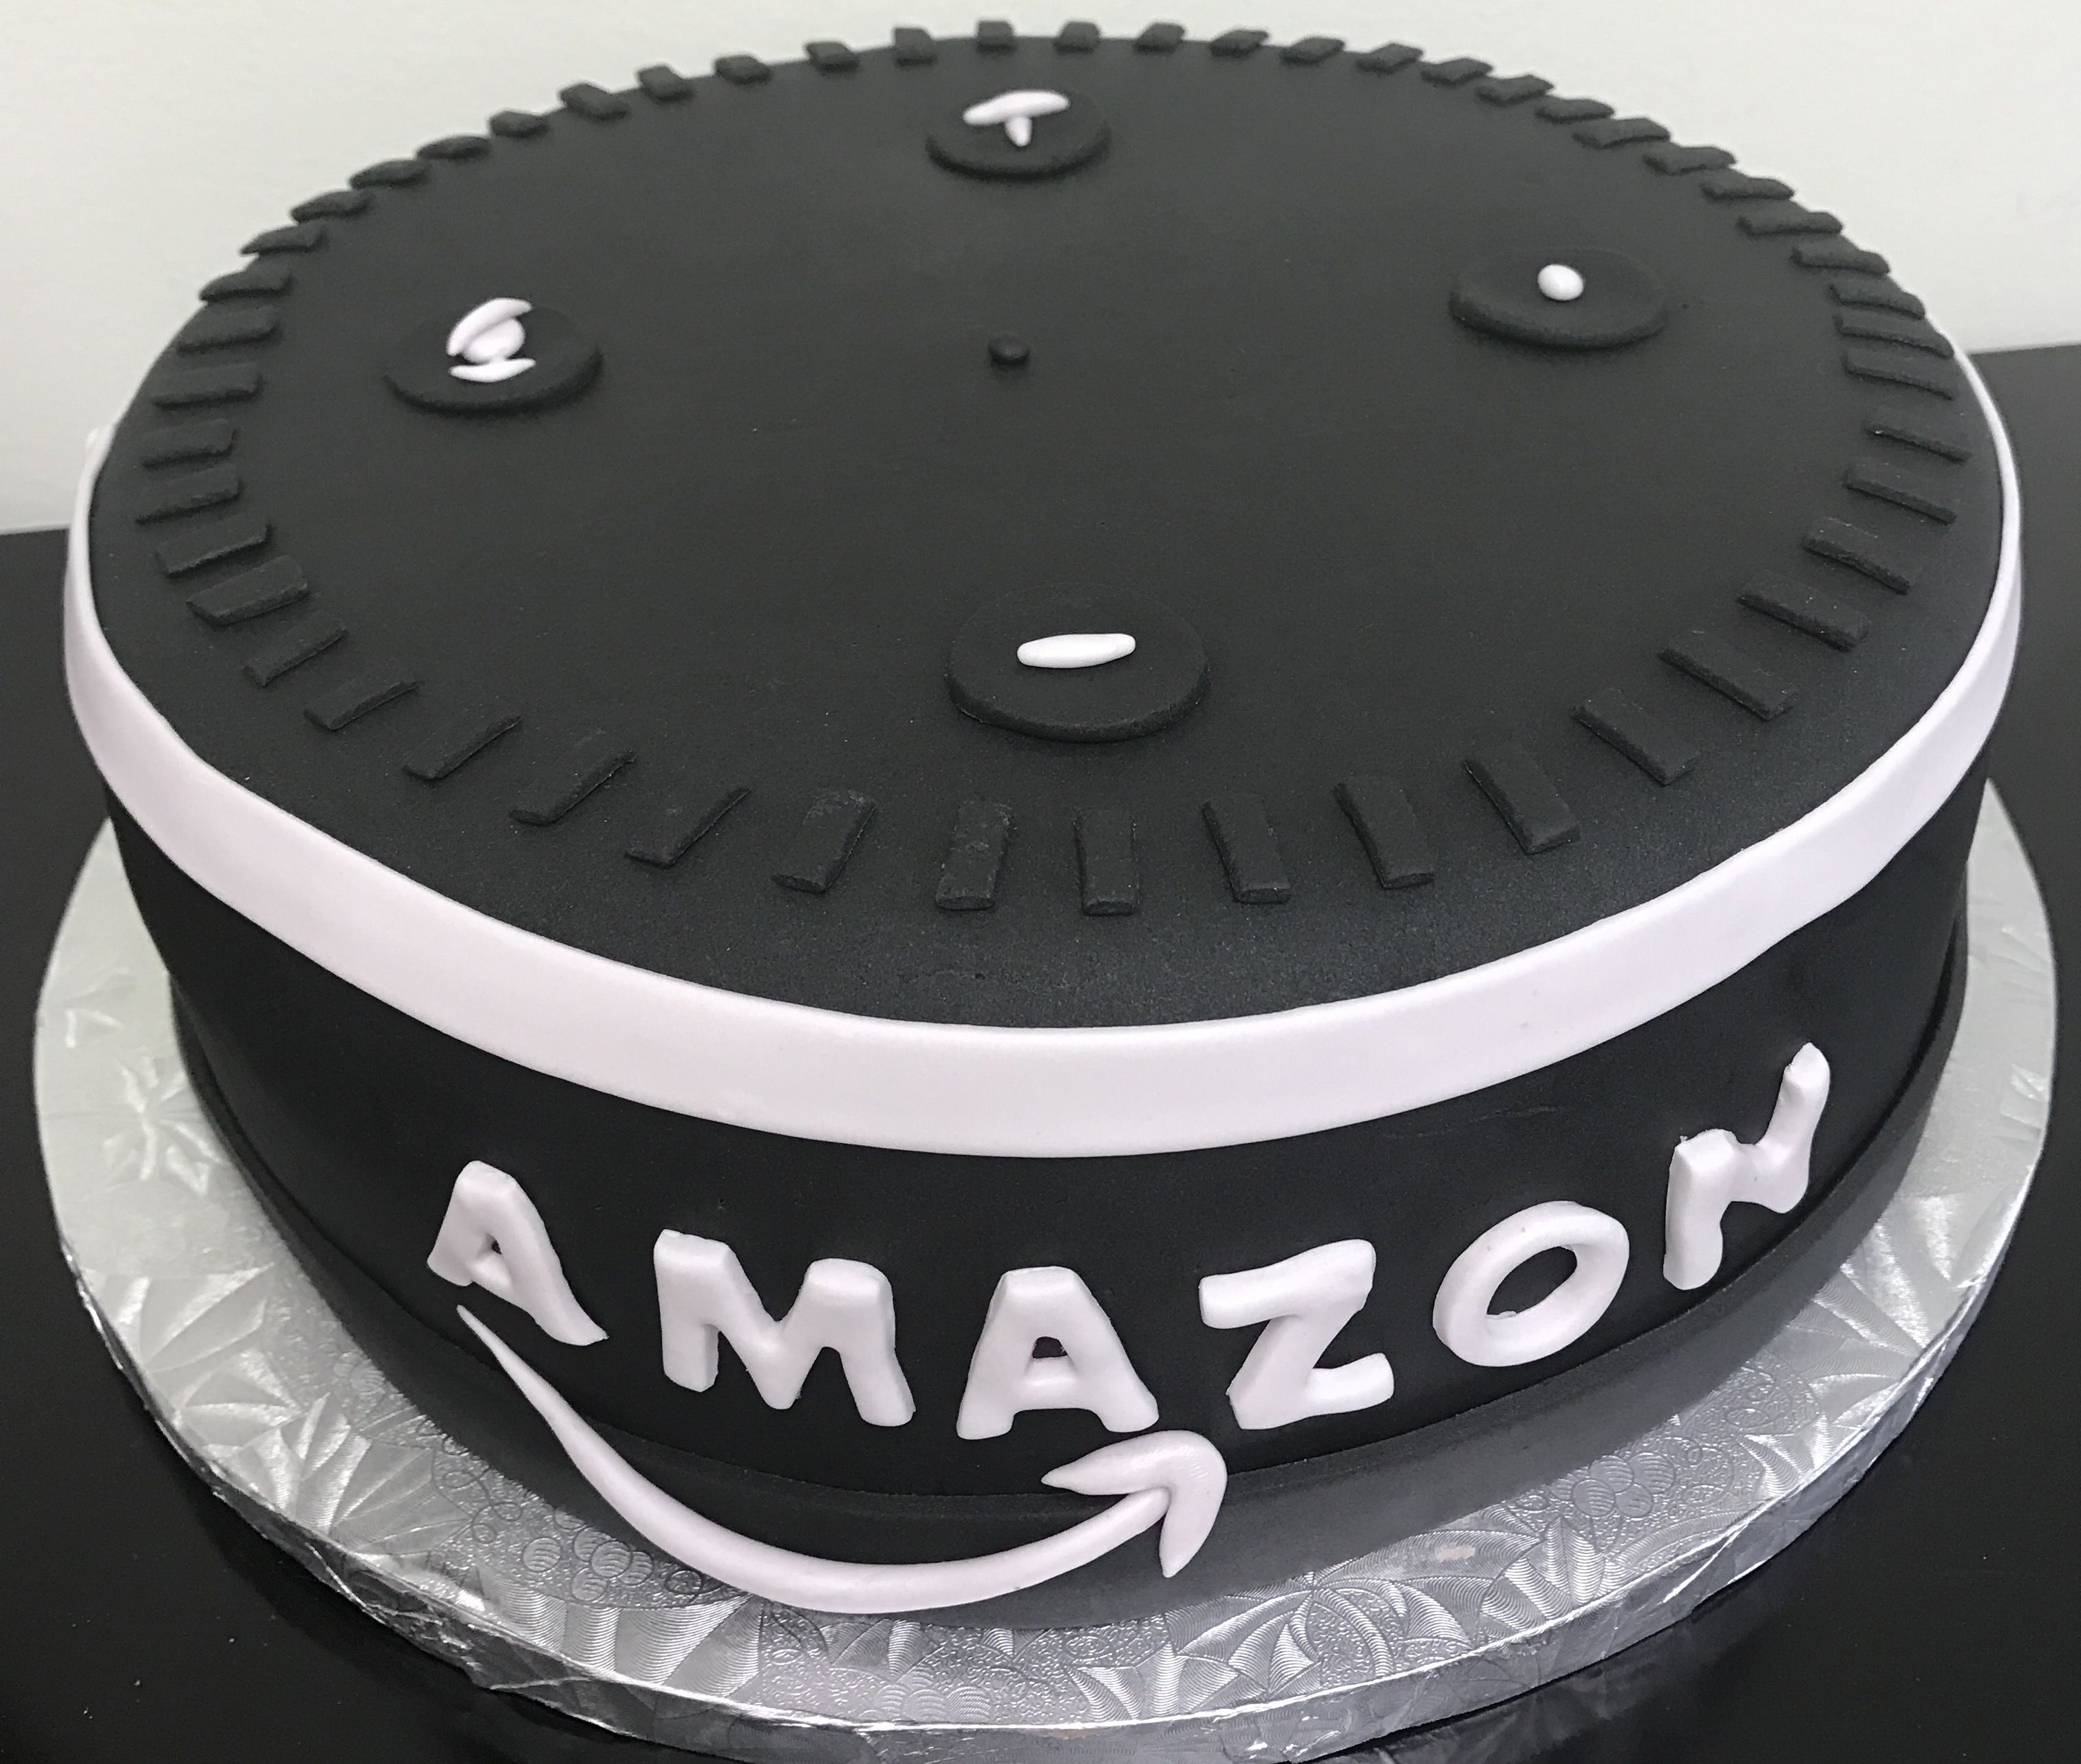 Amazon echo dot cake dot cakes how to make cake cake